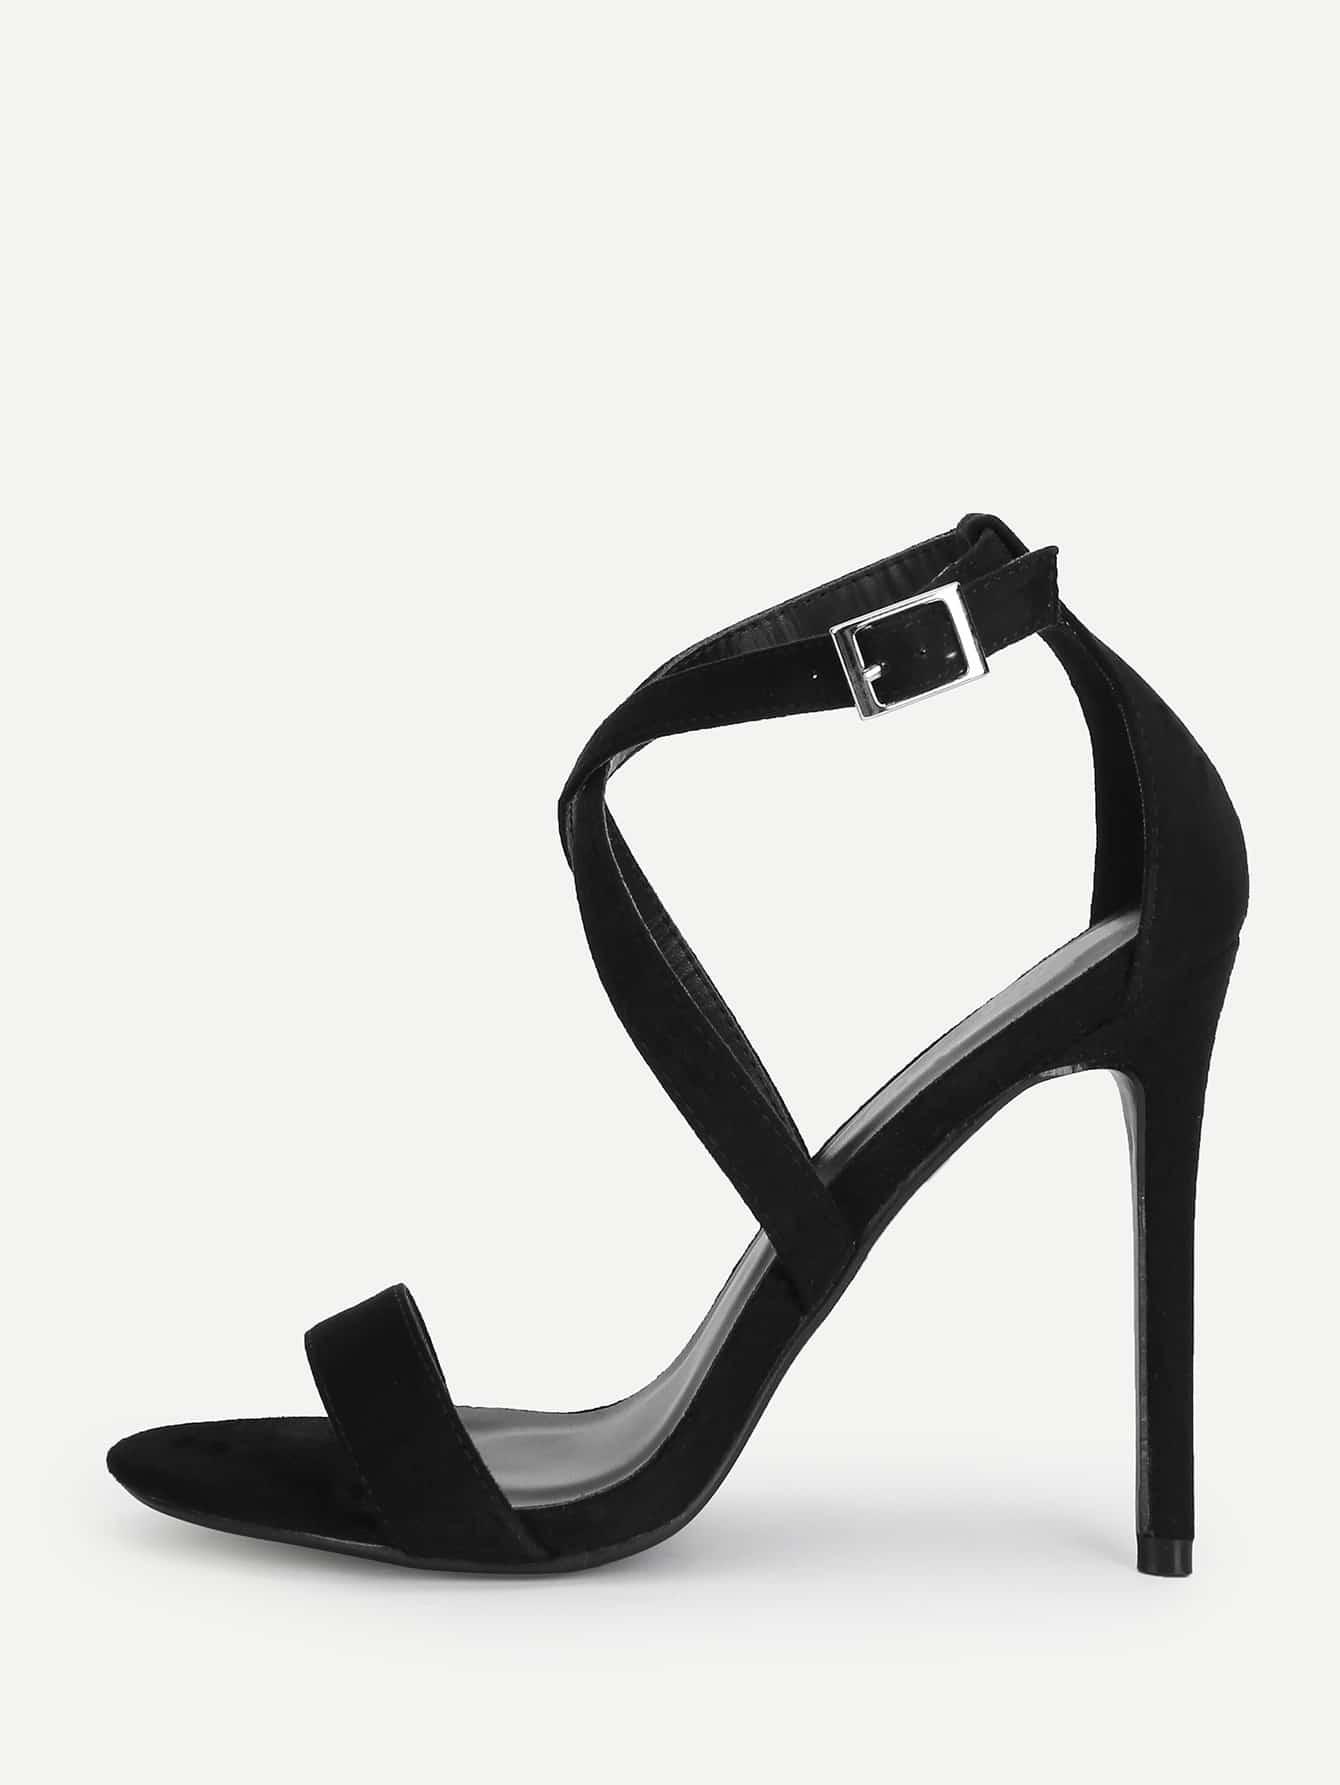 Peep Toe Criss Cross High Heels